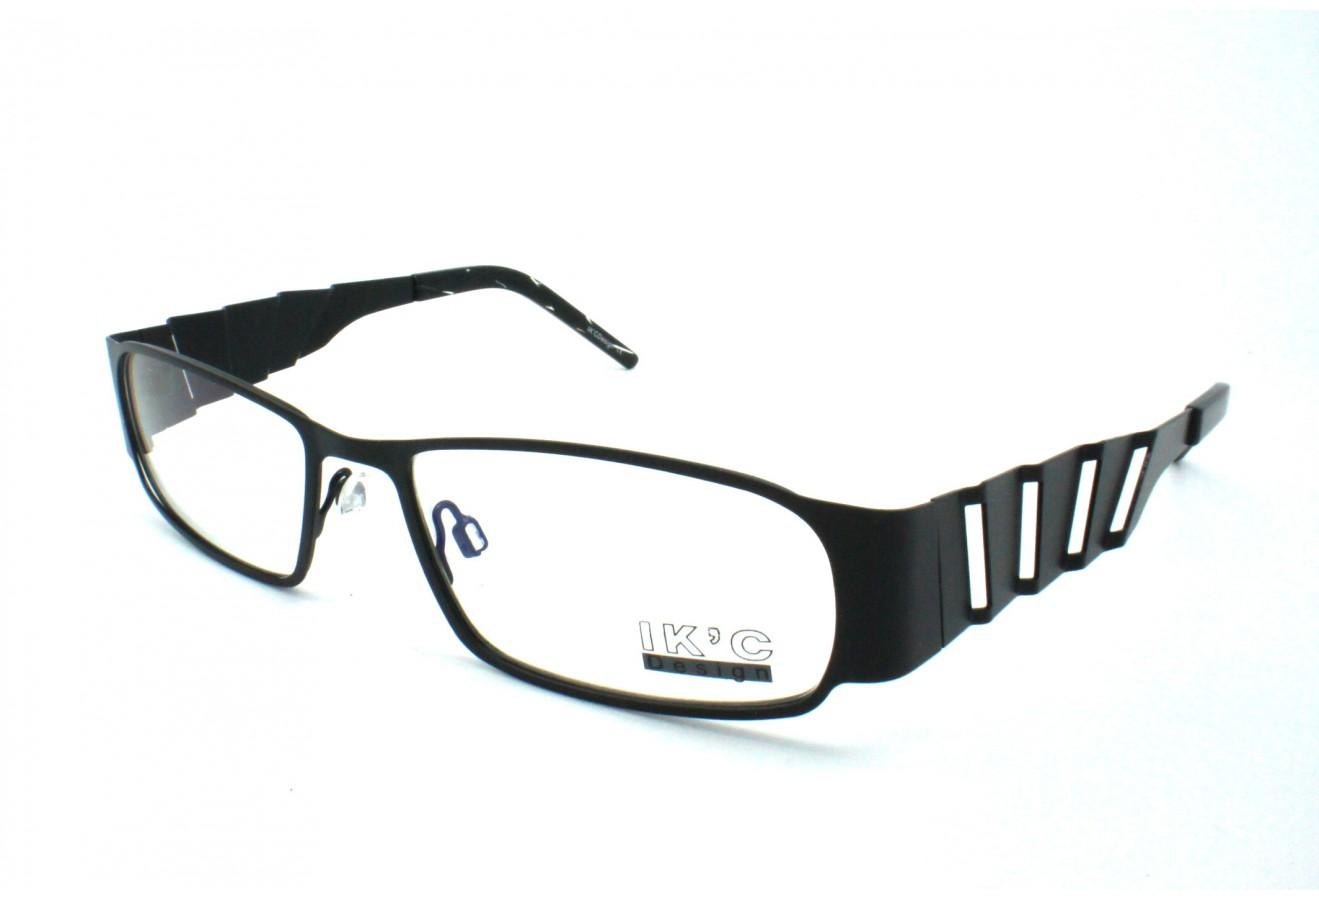 lunettes de vue js 1706 c1 54 17. Black Bedroom Furniture Sets. Home Design Ideas